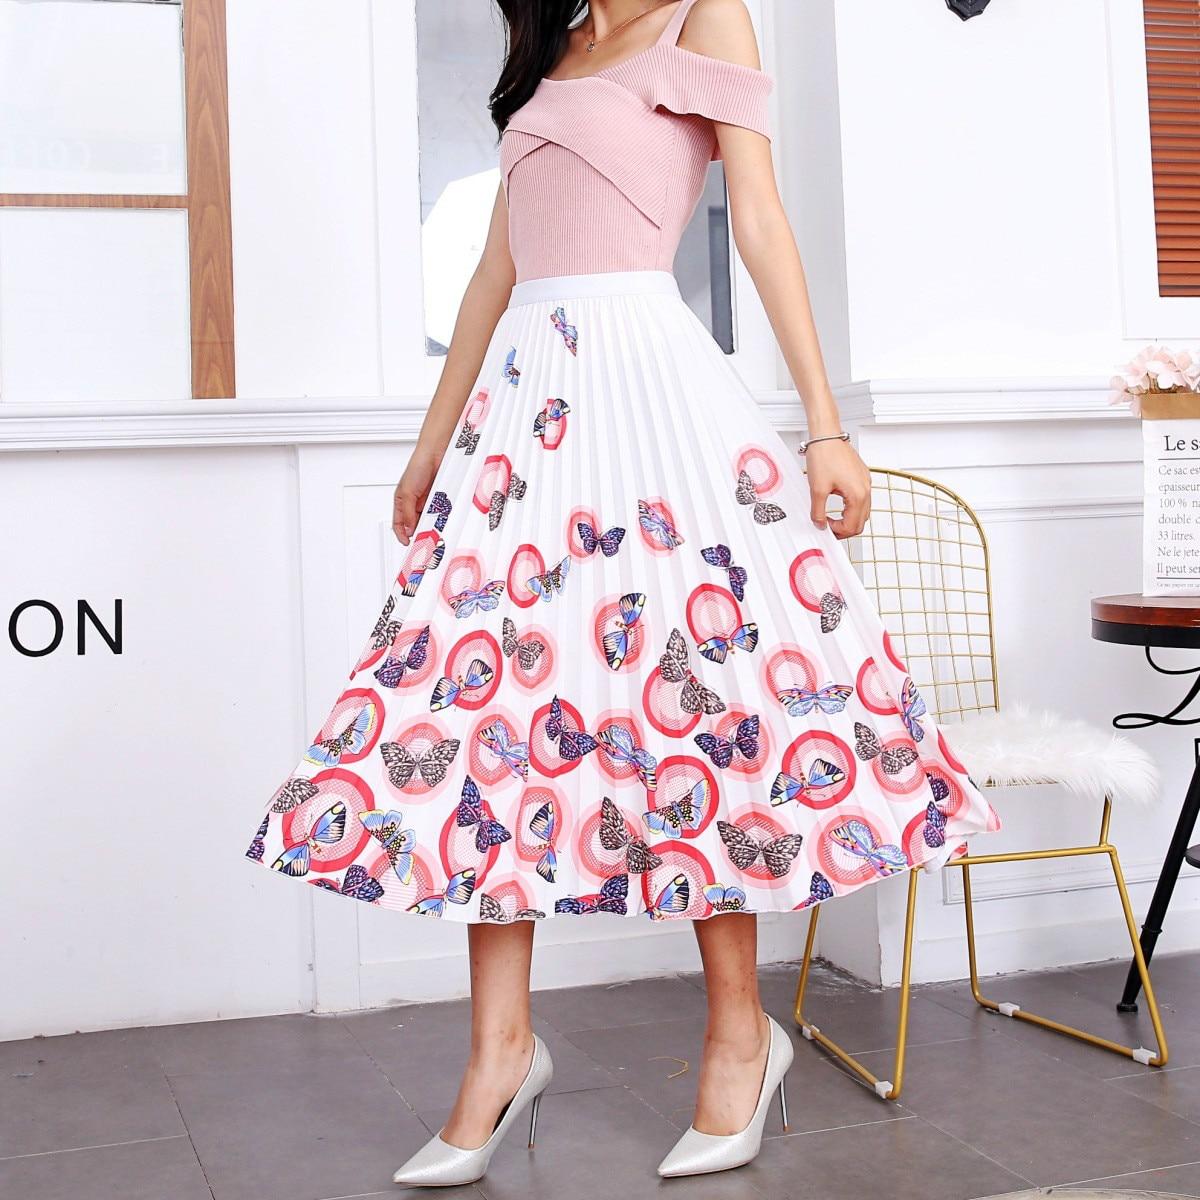 2020 New Summer Skirts Womens Butterfly Catroon Print Empire High Waist Elastci Pleated Midi Skirt European High Street Style 1